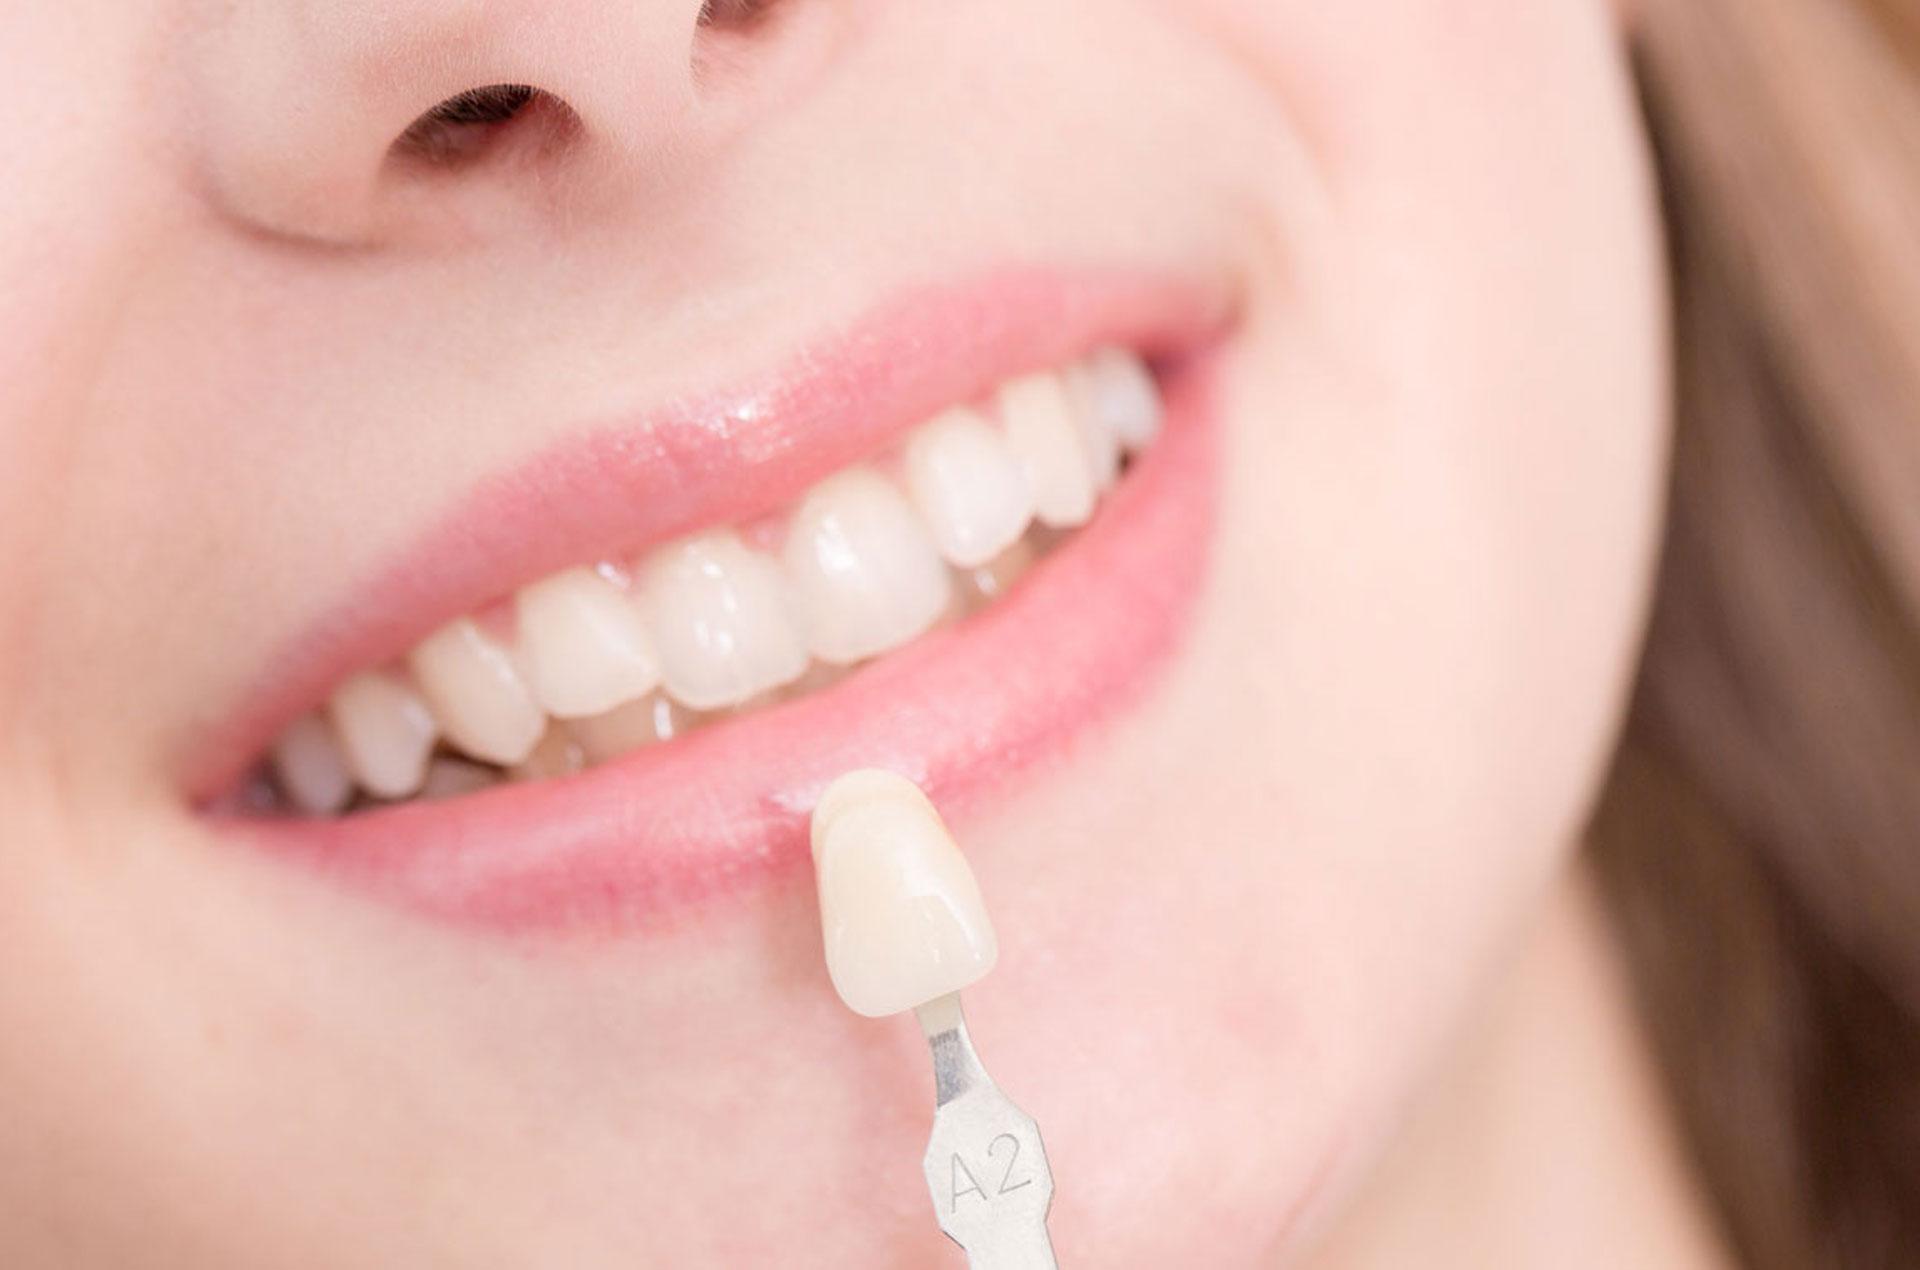 Dental Crowns - Dental Implants